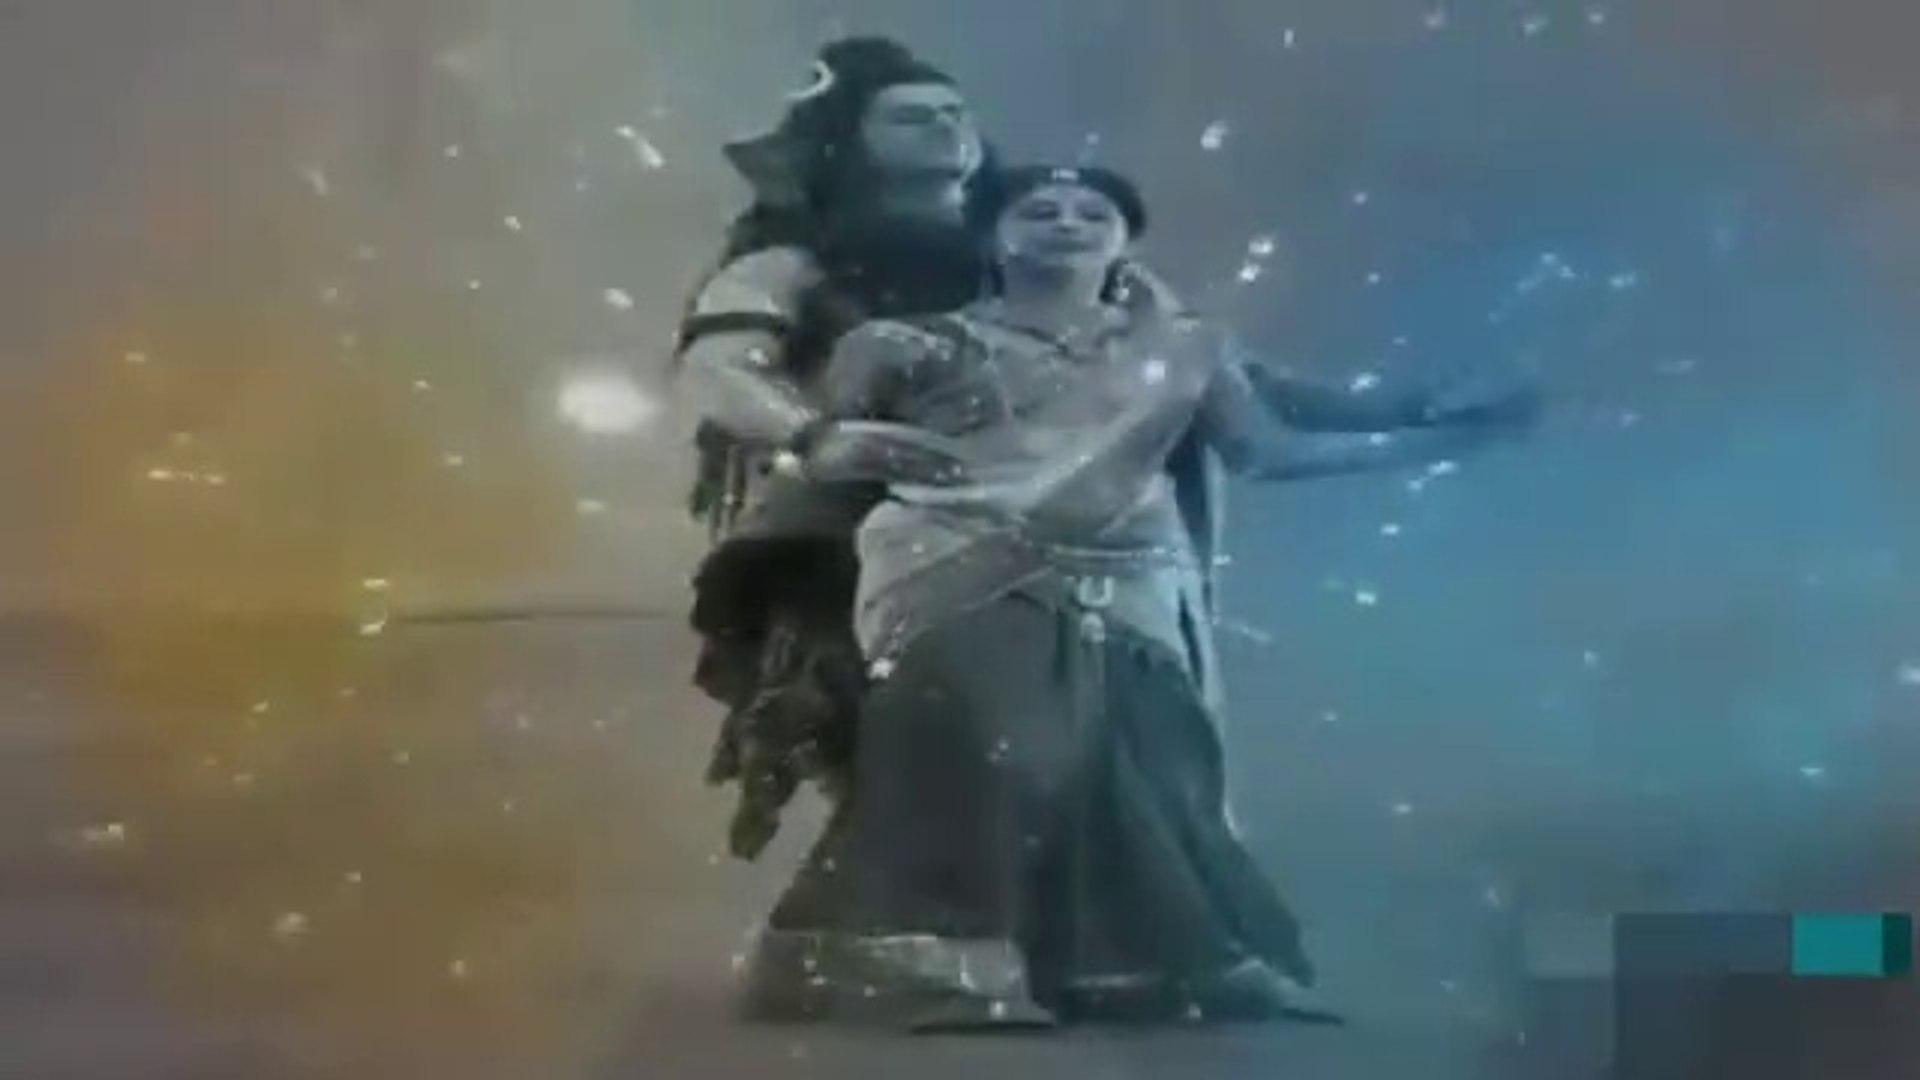 Lord Shiva Devotional Video Songs & Music Mix ft Stories of Lord Shiva,  Vishnu, Brahma | Maha Shivarathri Special Songs | Shiva Temples & Shivalaya  Ottam | Hindu Devotional Songs | Story of Lord Shiva